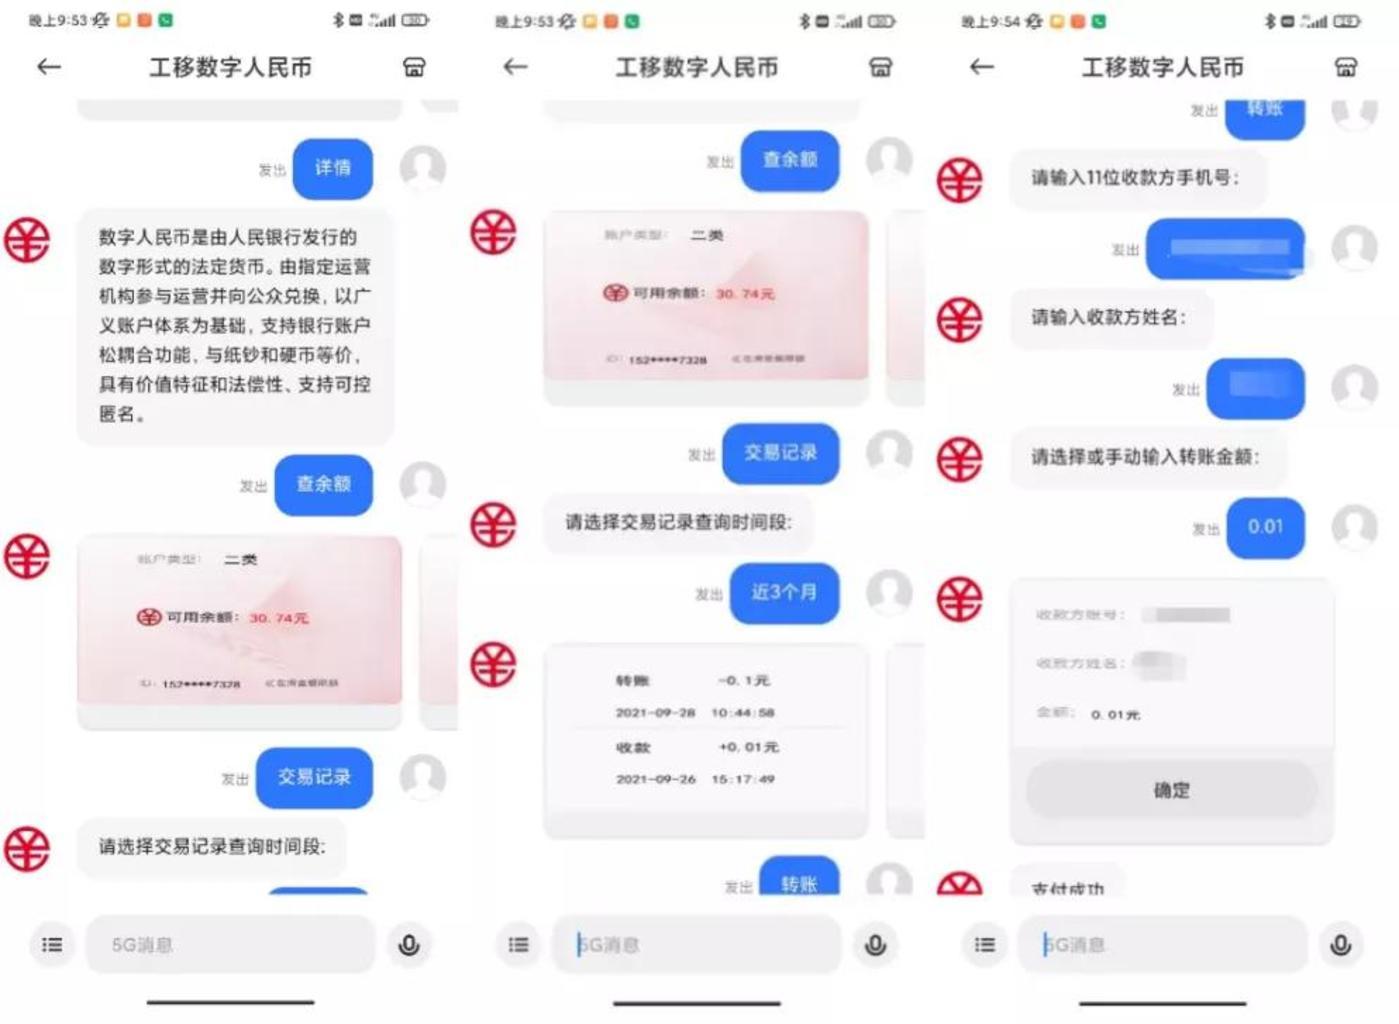 (5G消息平台上的数字人民币查询和转账)